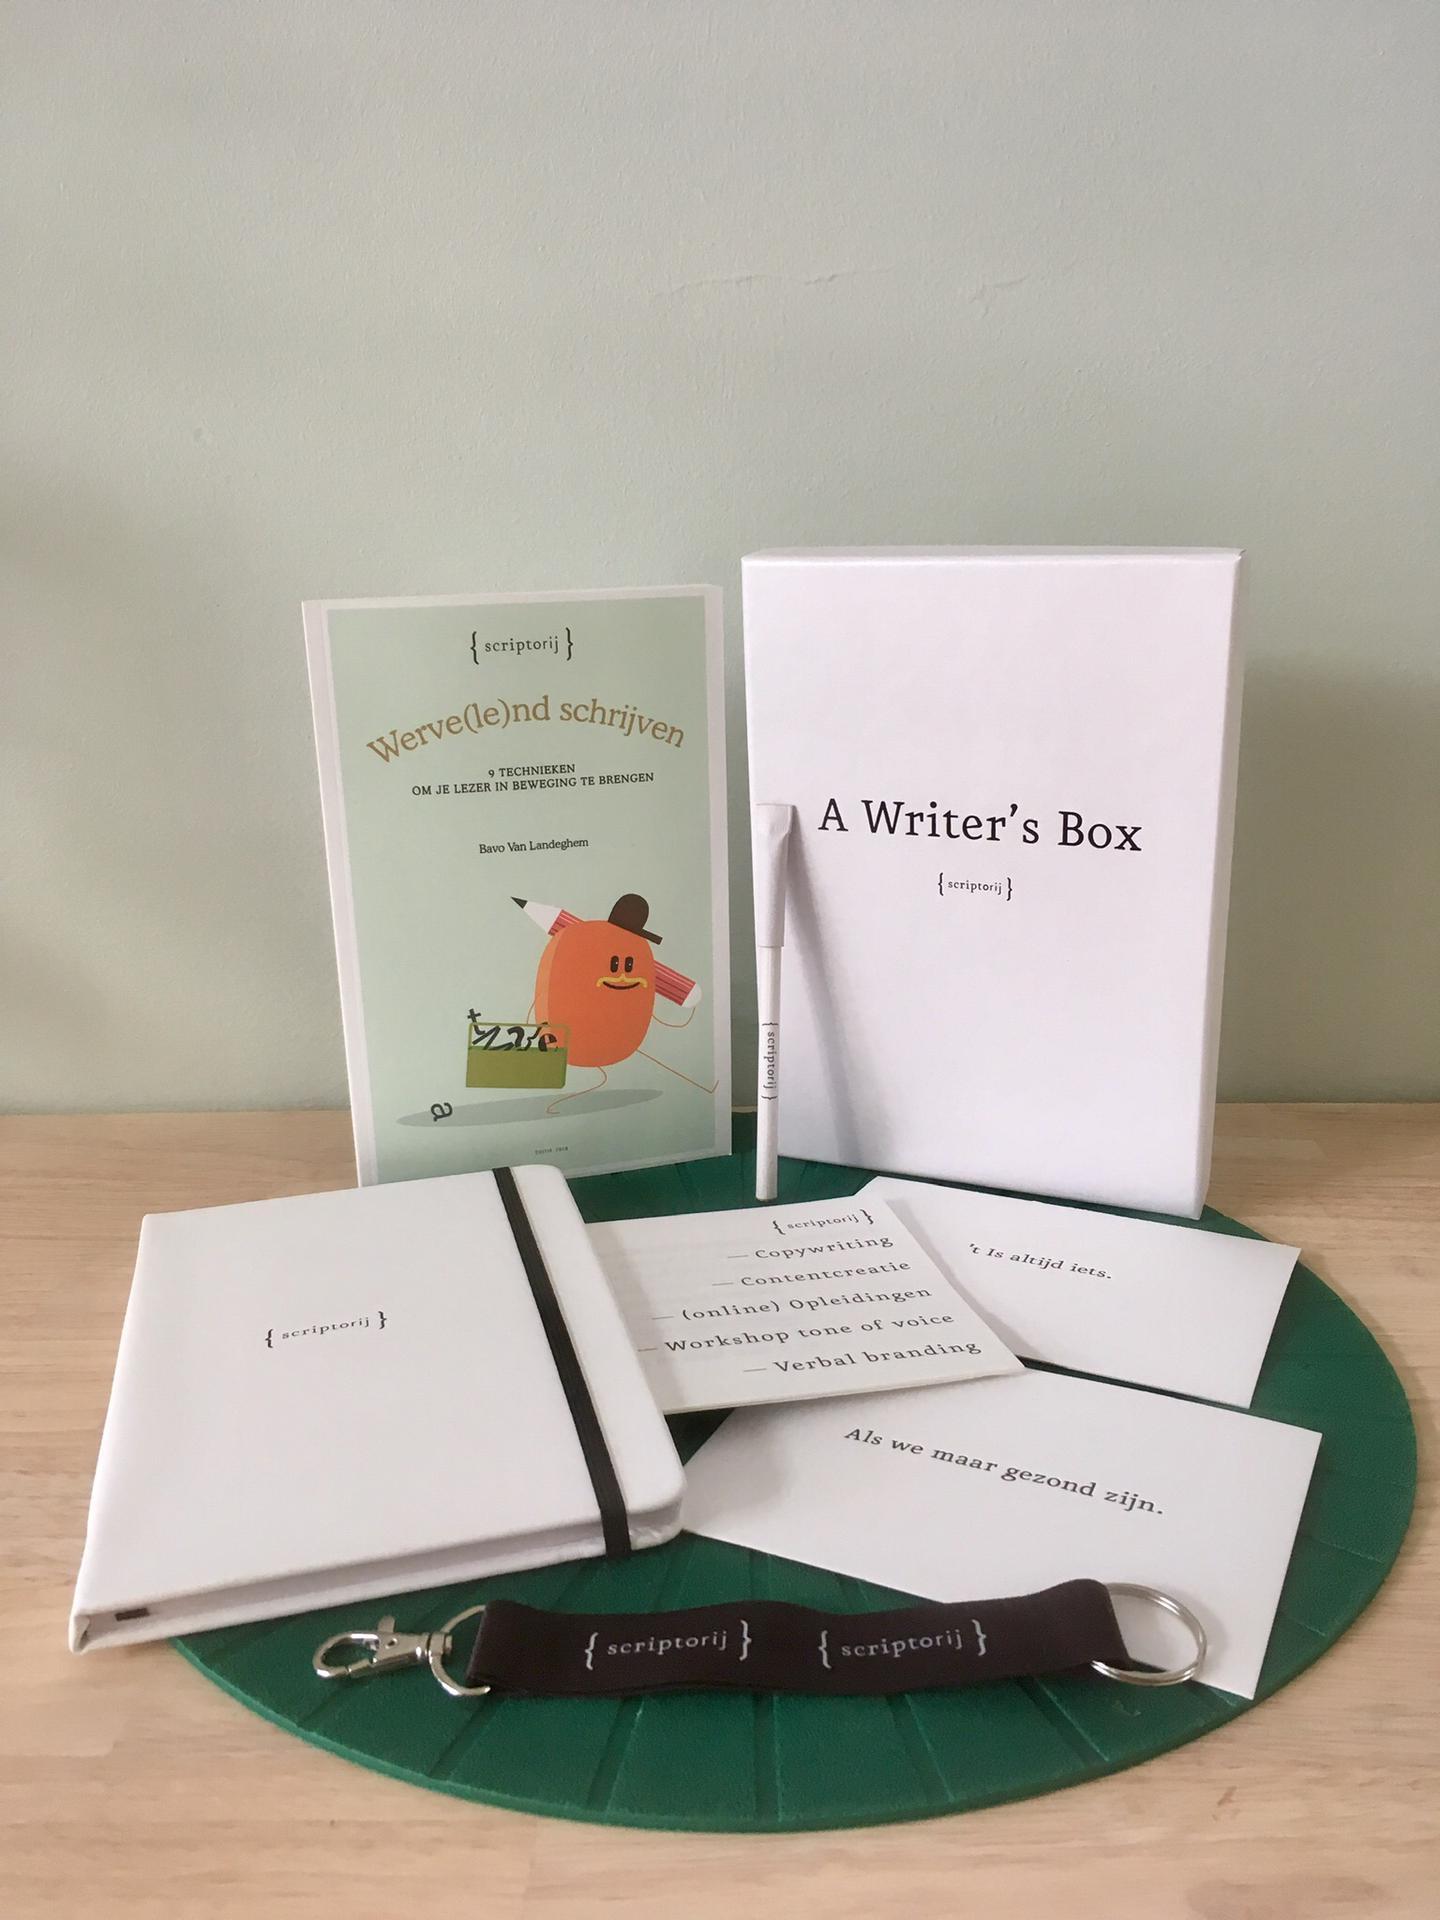 online opleiding copywriting scriptorij a Writer's box